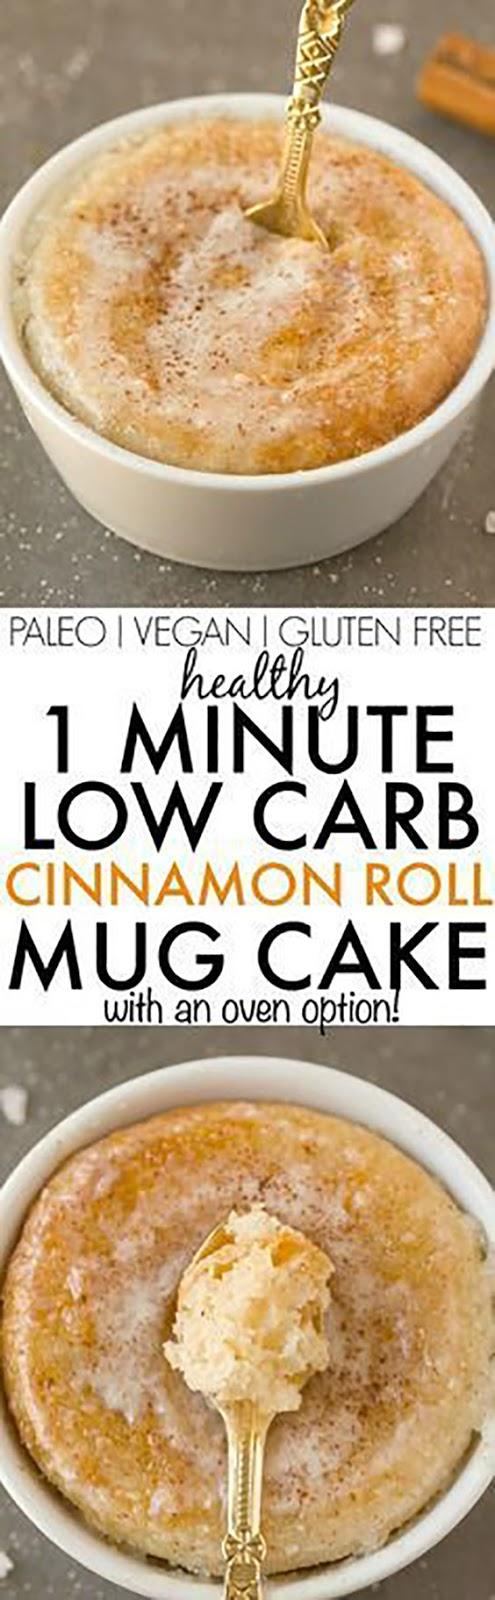 Healthy 1 Minute Low Carb Cinnamon Roll Mug Cake (Vegan + Sugar Free)